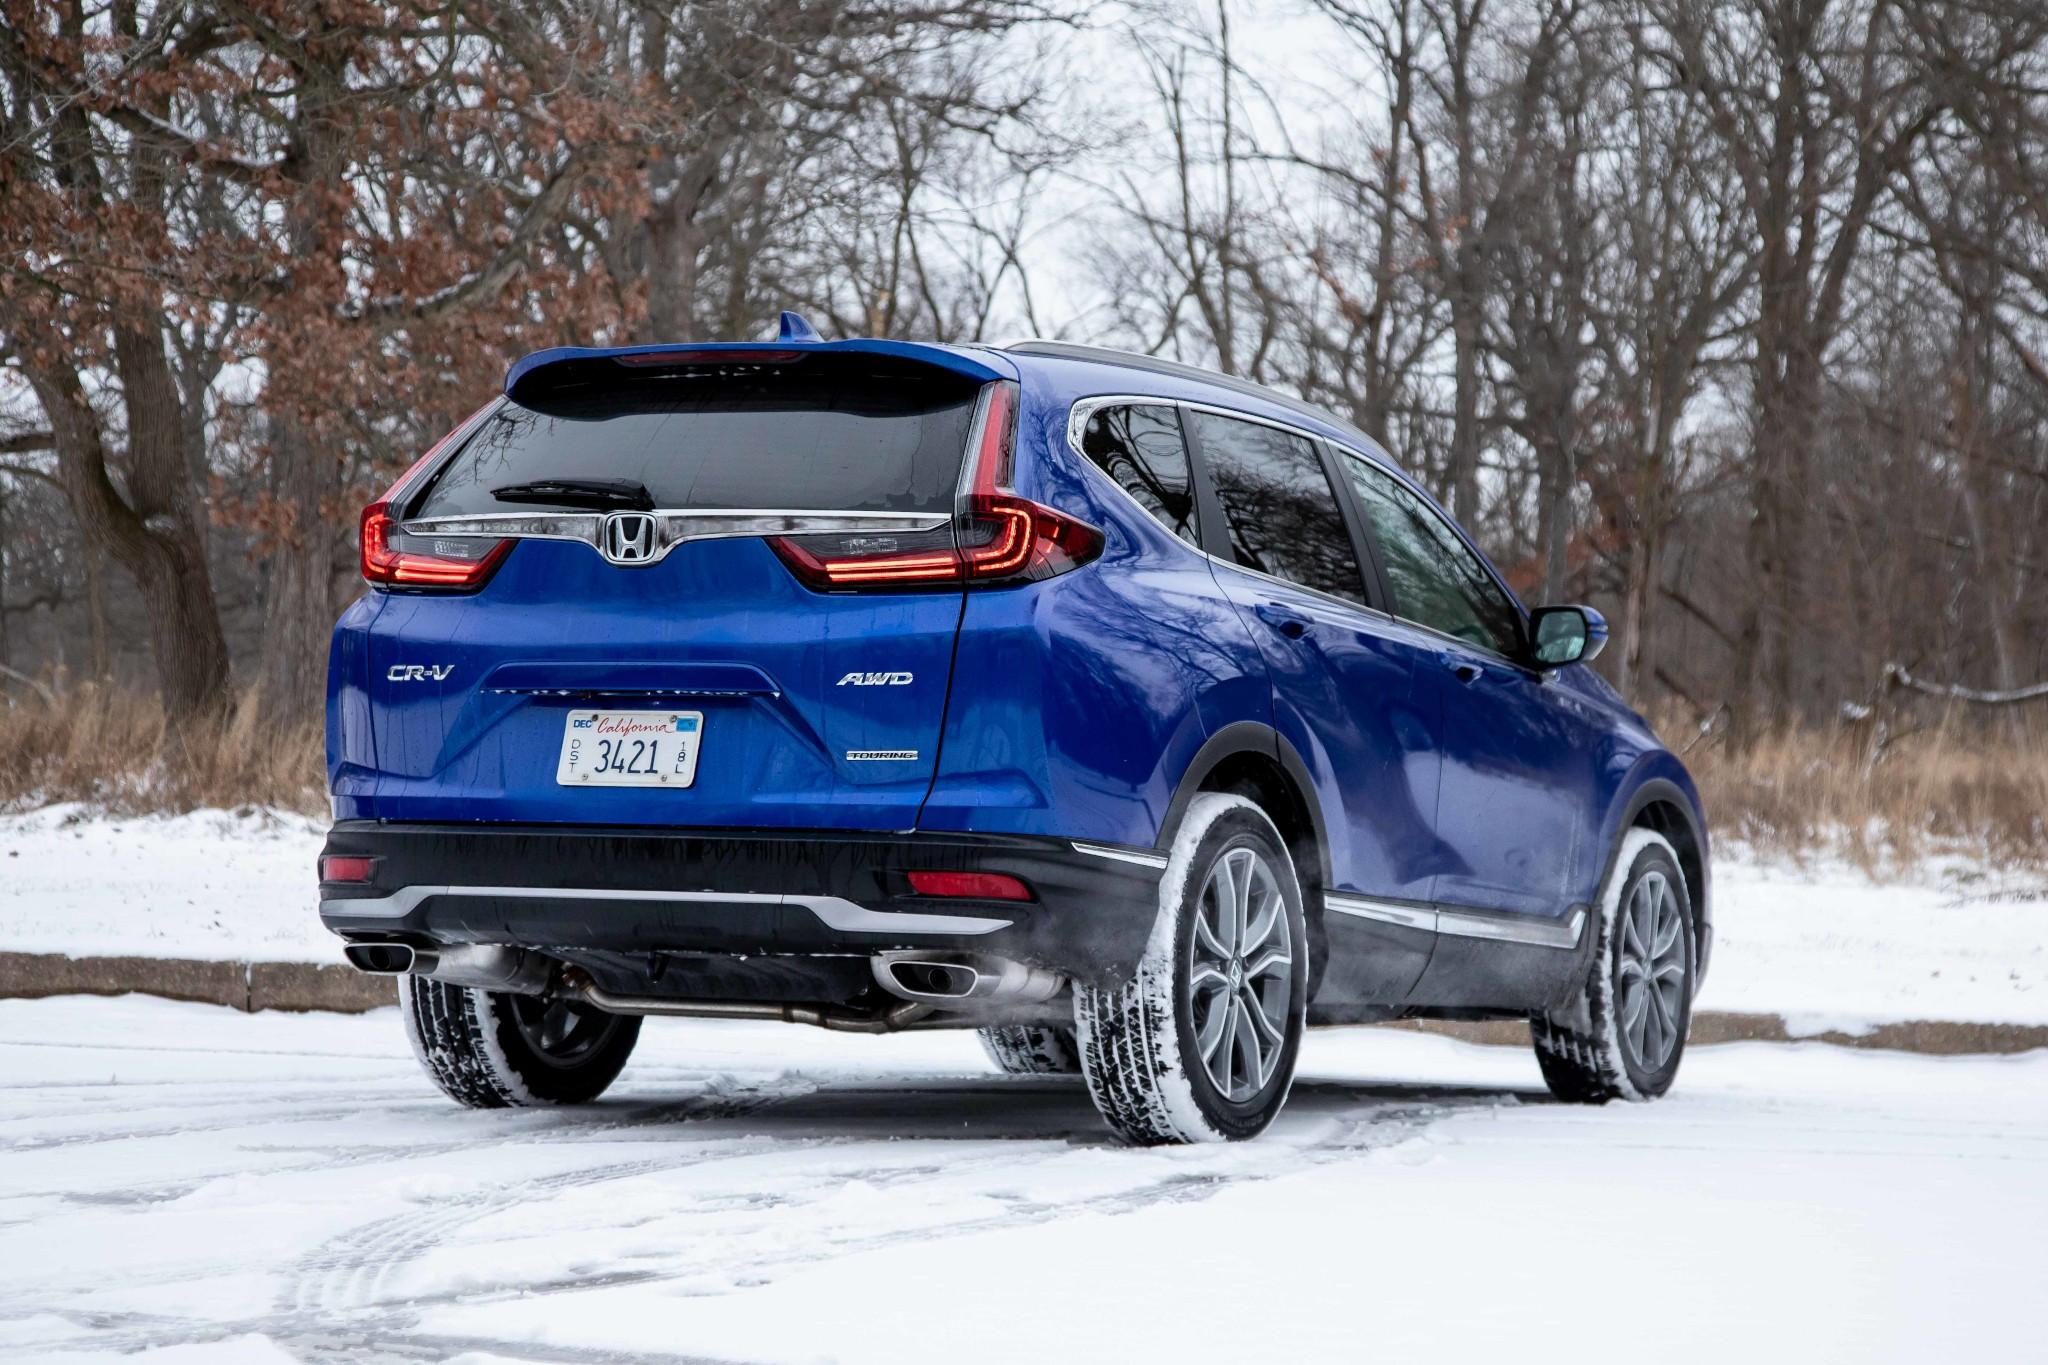 honda-cr-v-2020-05-angle--blue--exterior--rear.jpg